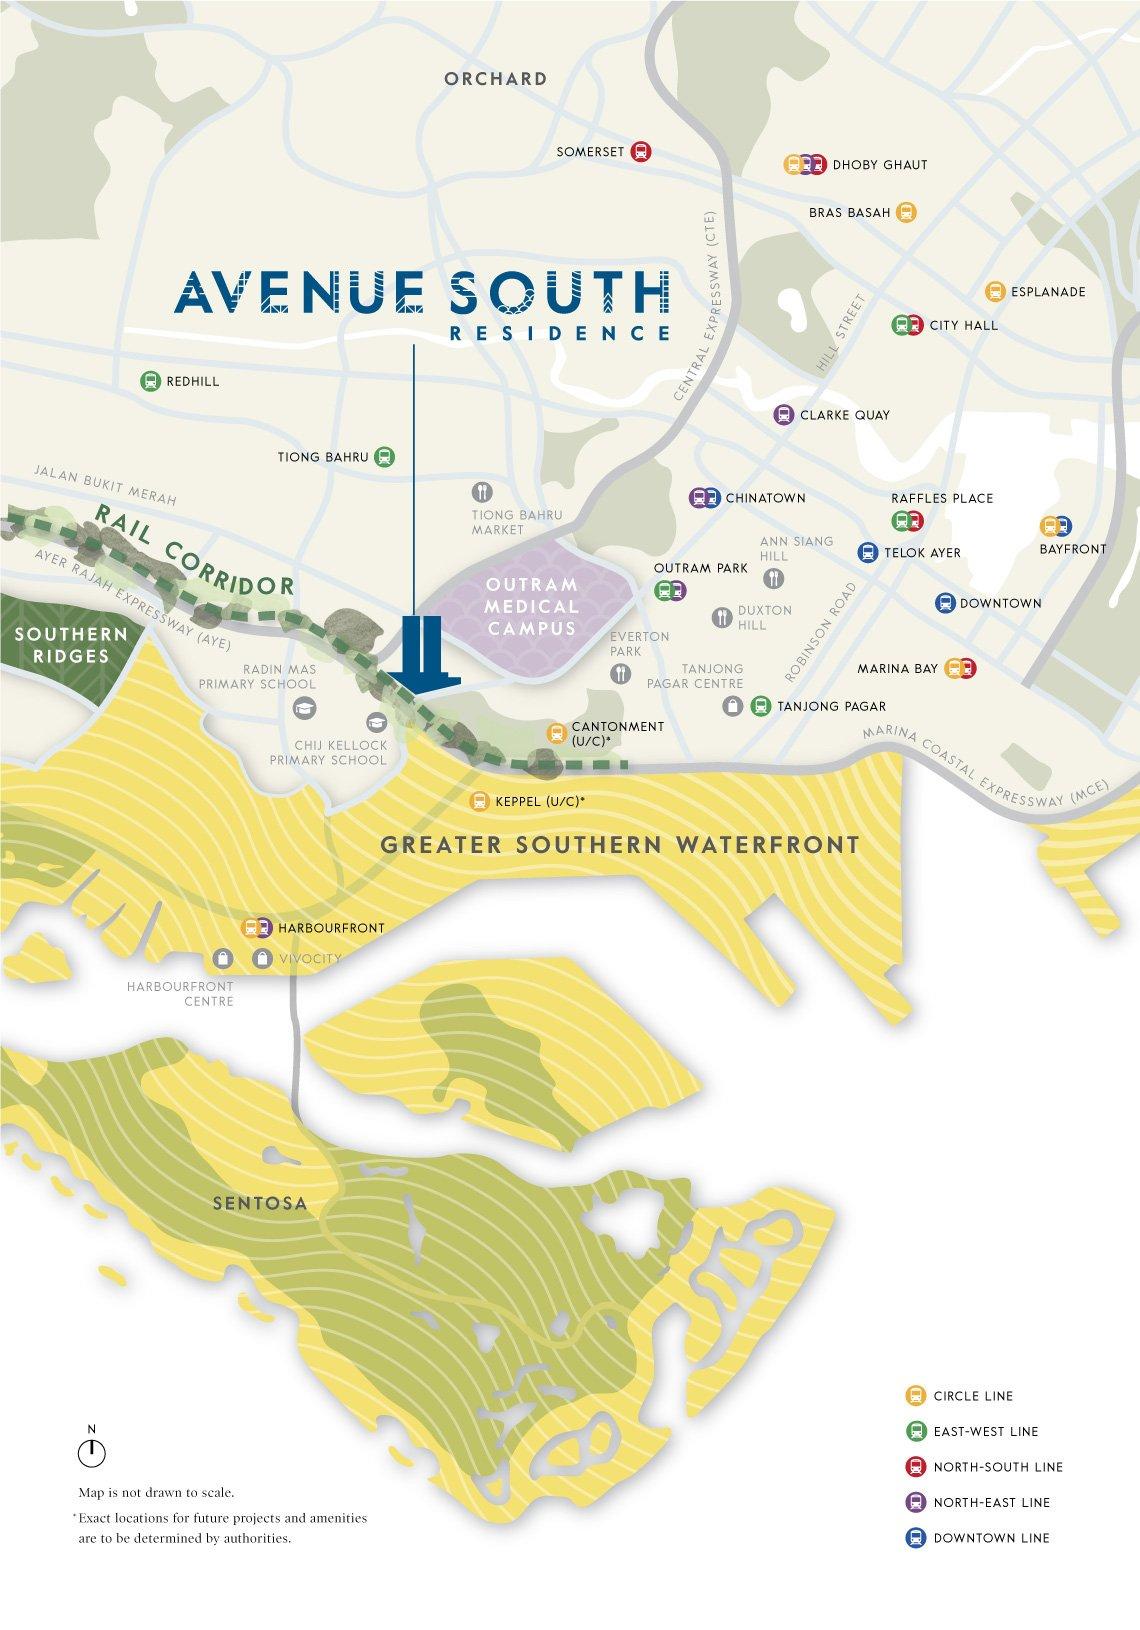 avenue south residence 南峰雅苑 location map